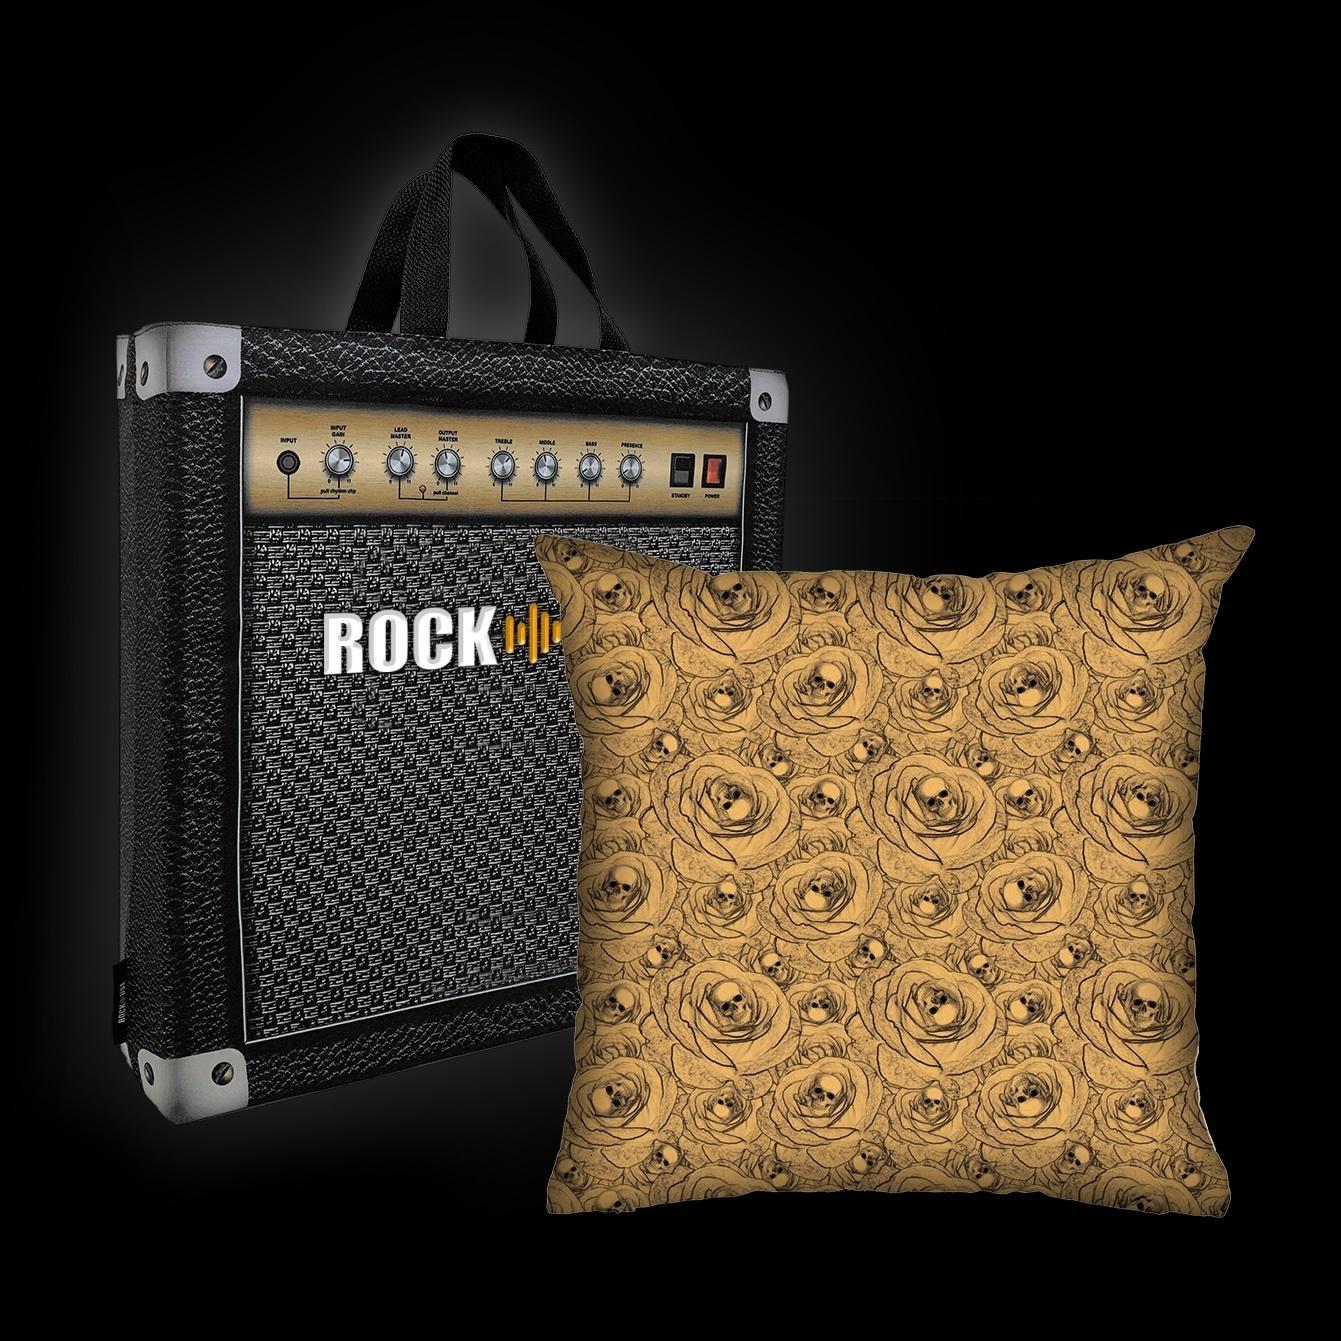 Kit Almofada & Sacola Rock Use - Skull & Roses - Bege